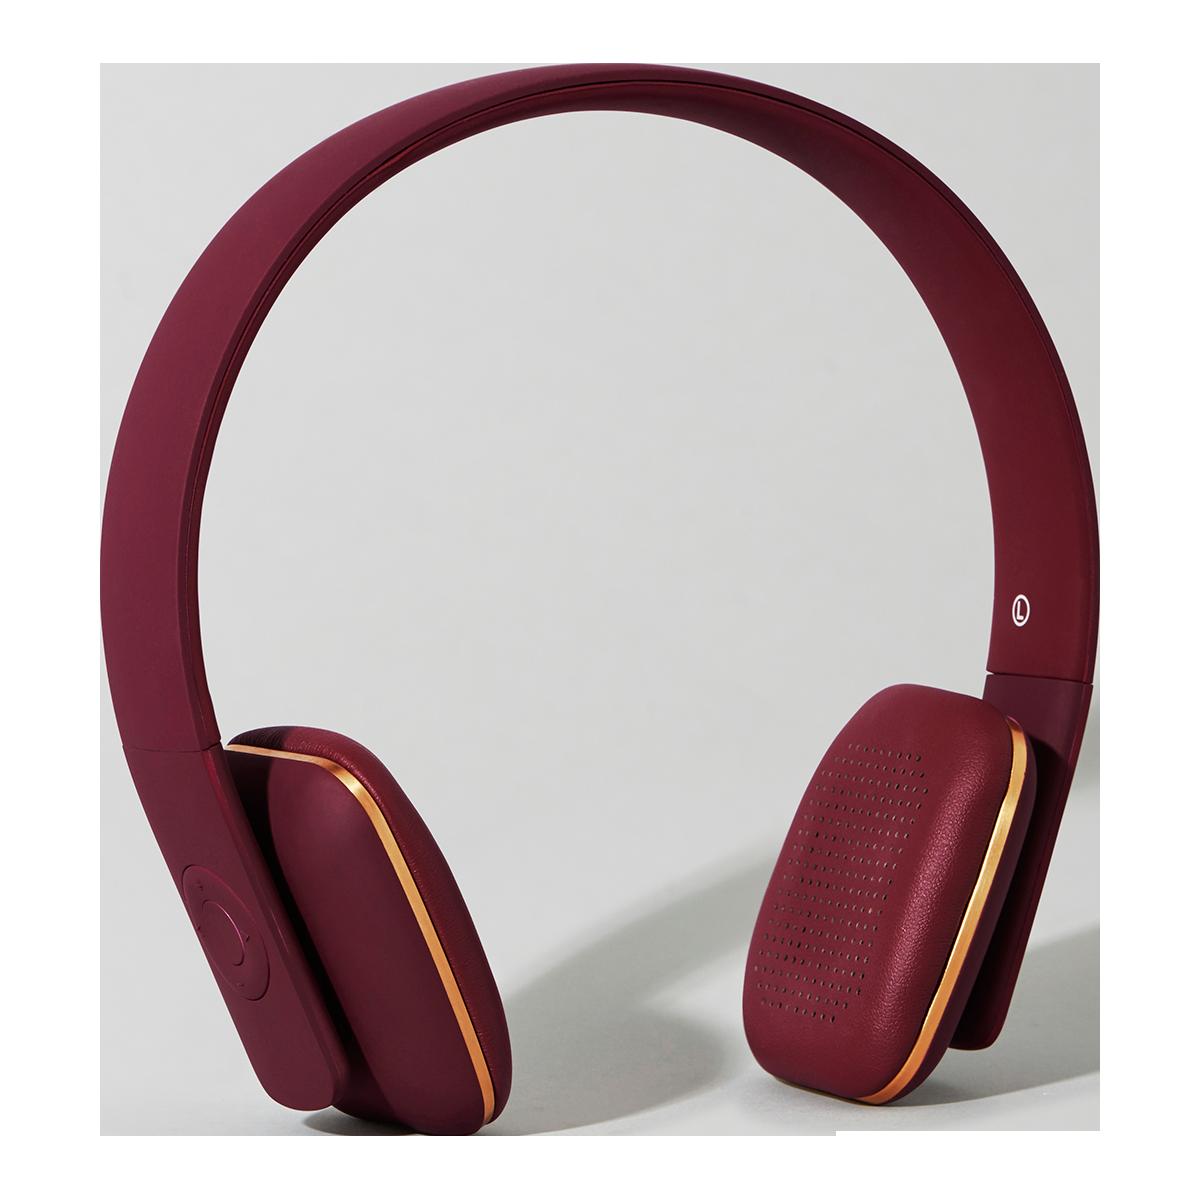 KreaFunk - aHead Headset - Plum (Kfss07)